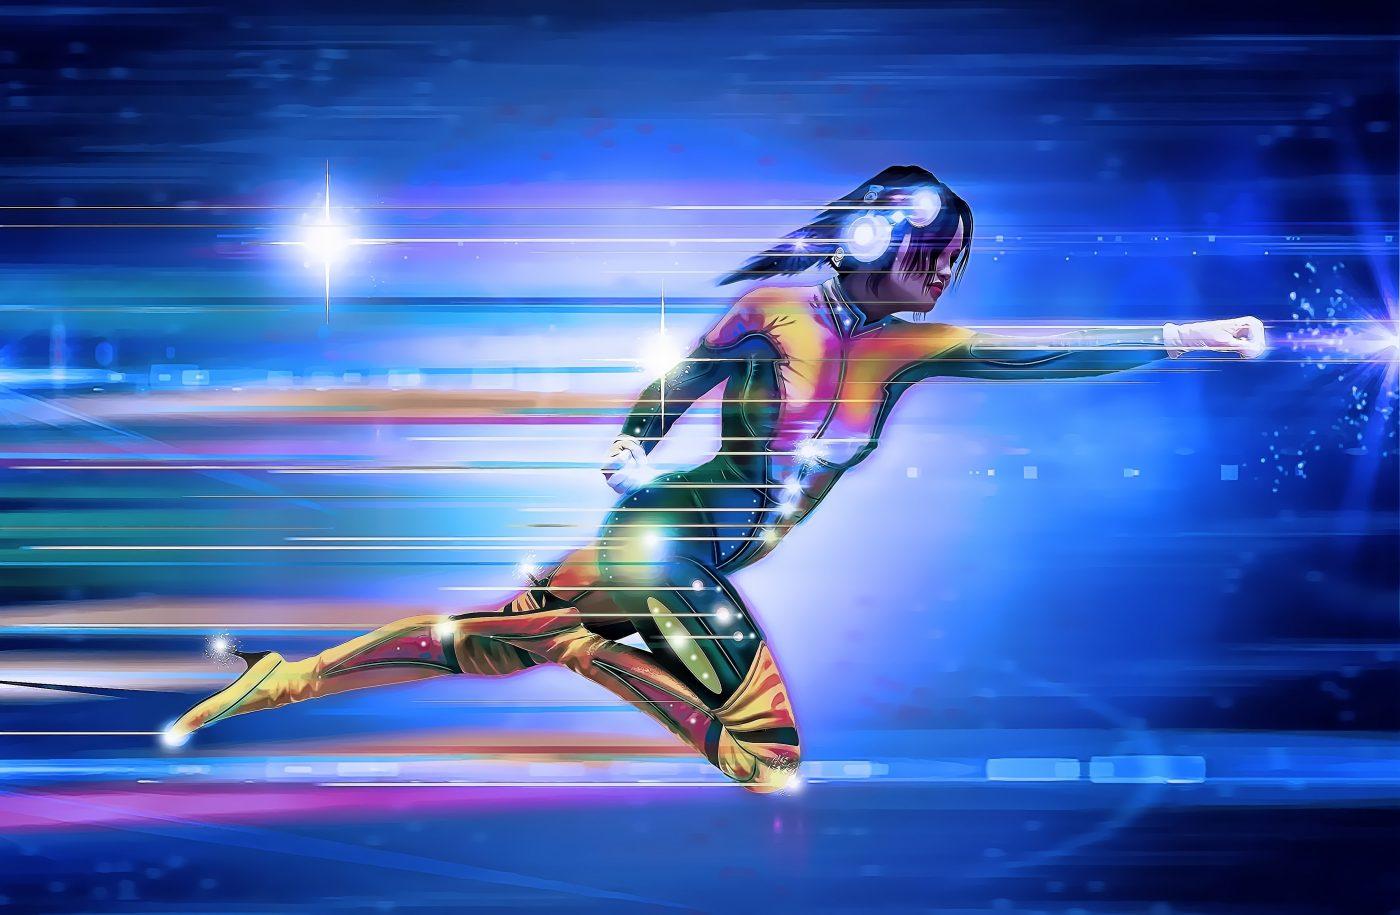 superhero, girl, speed